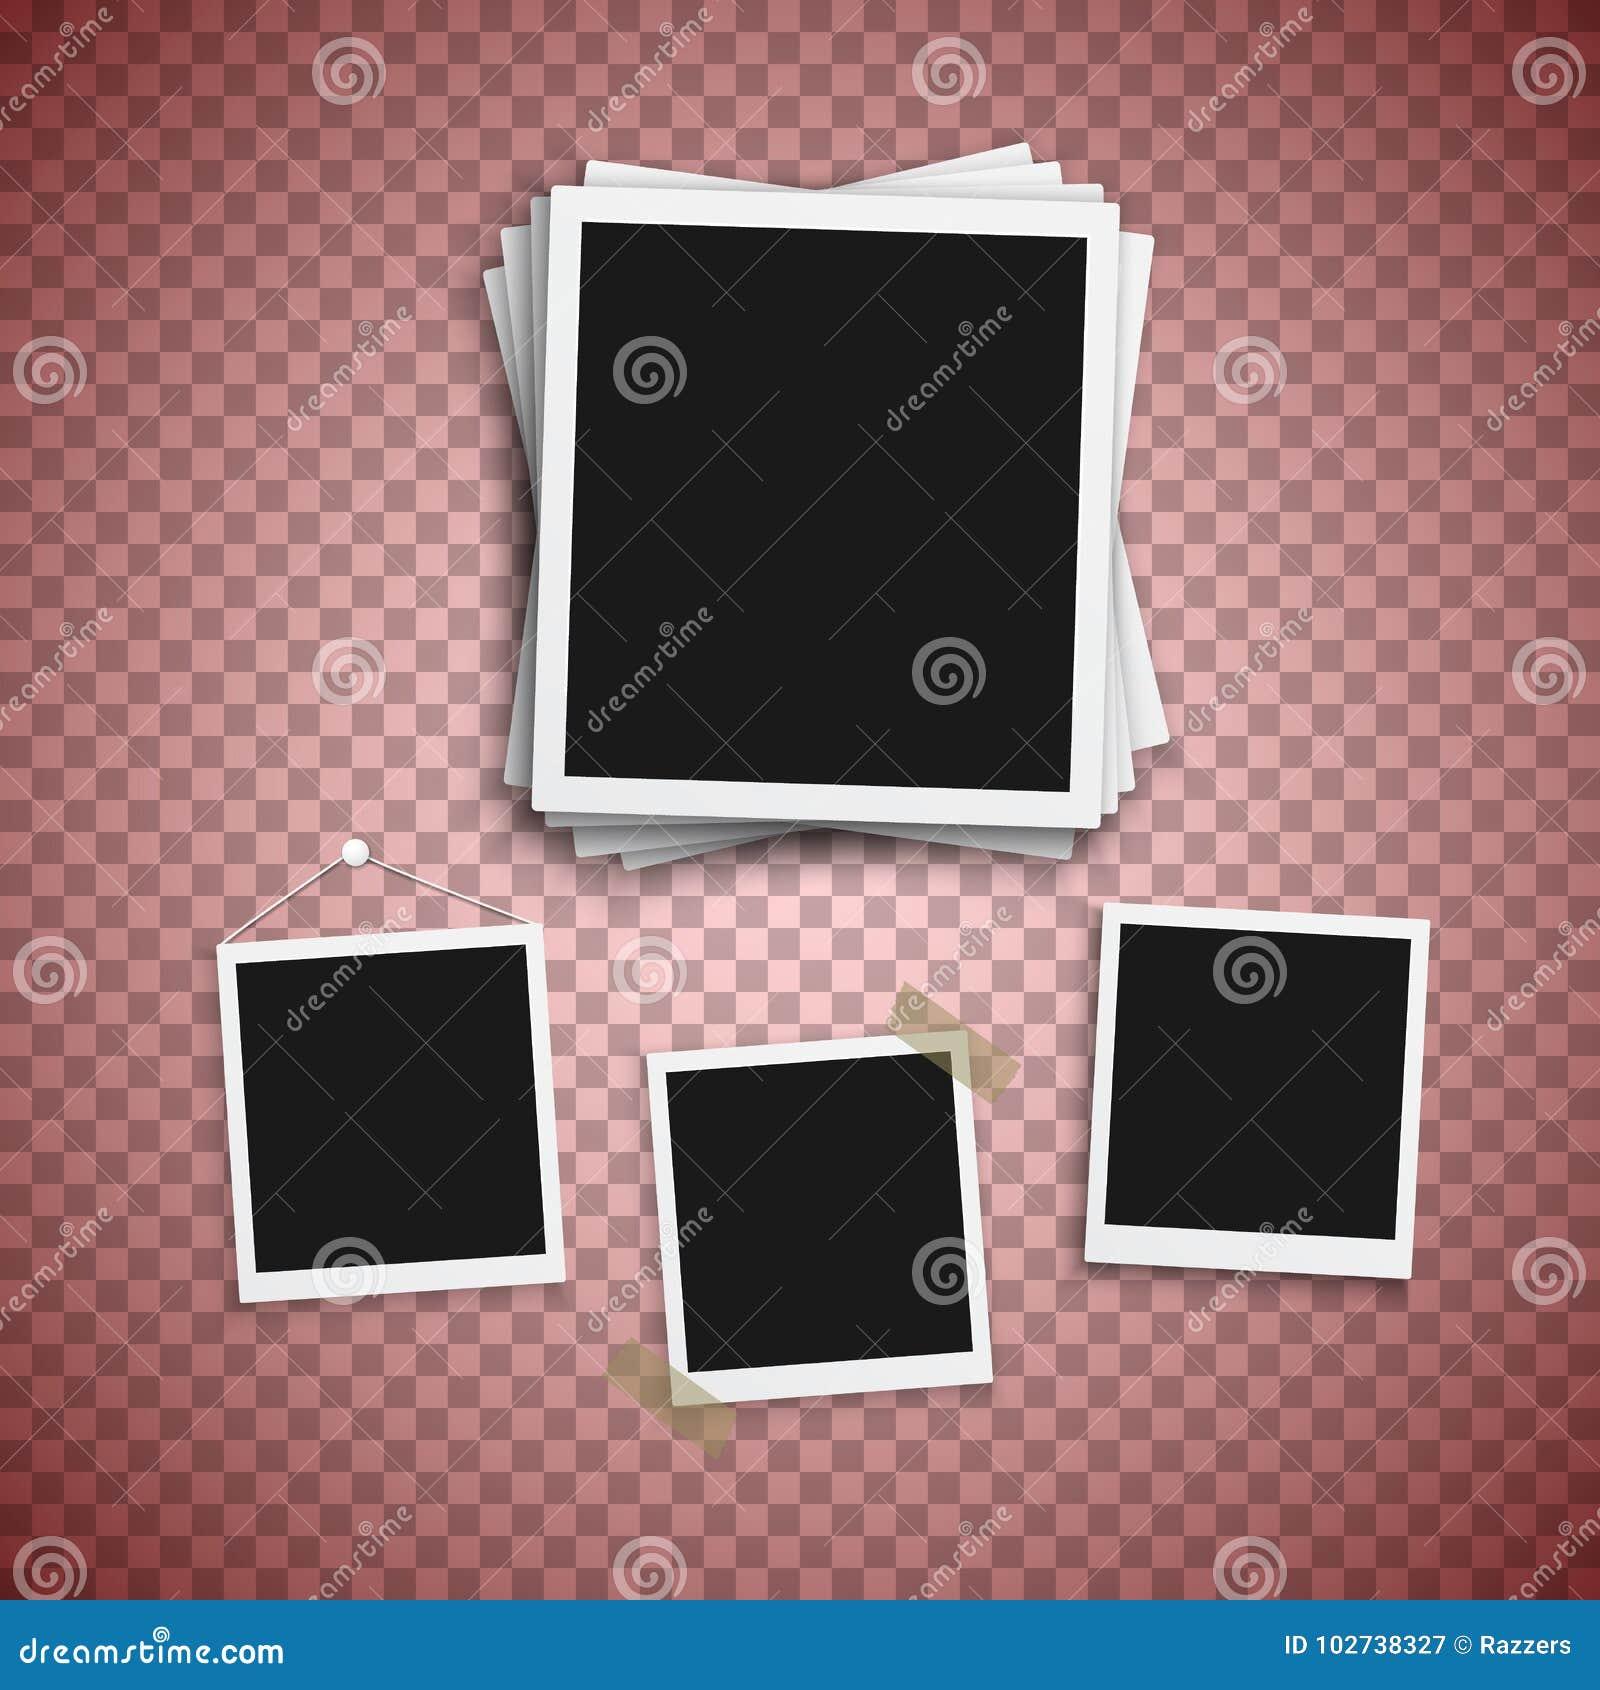 vector photo frame realistic snapshot modern photo instant album